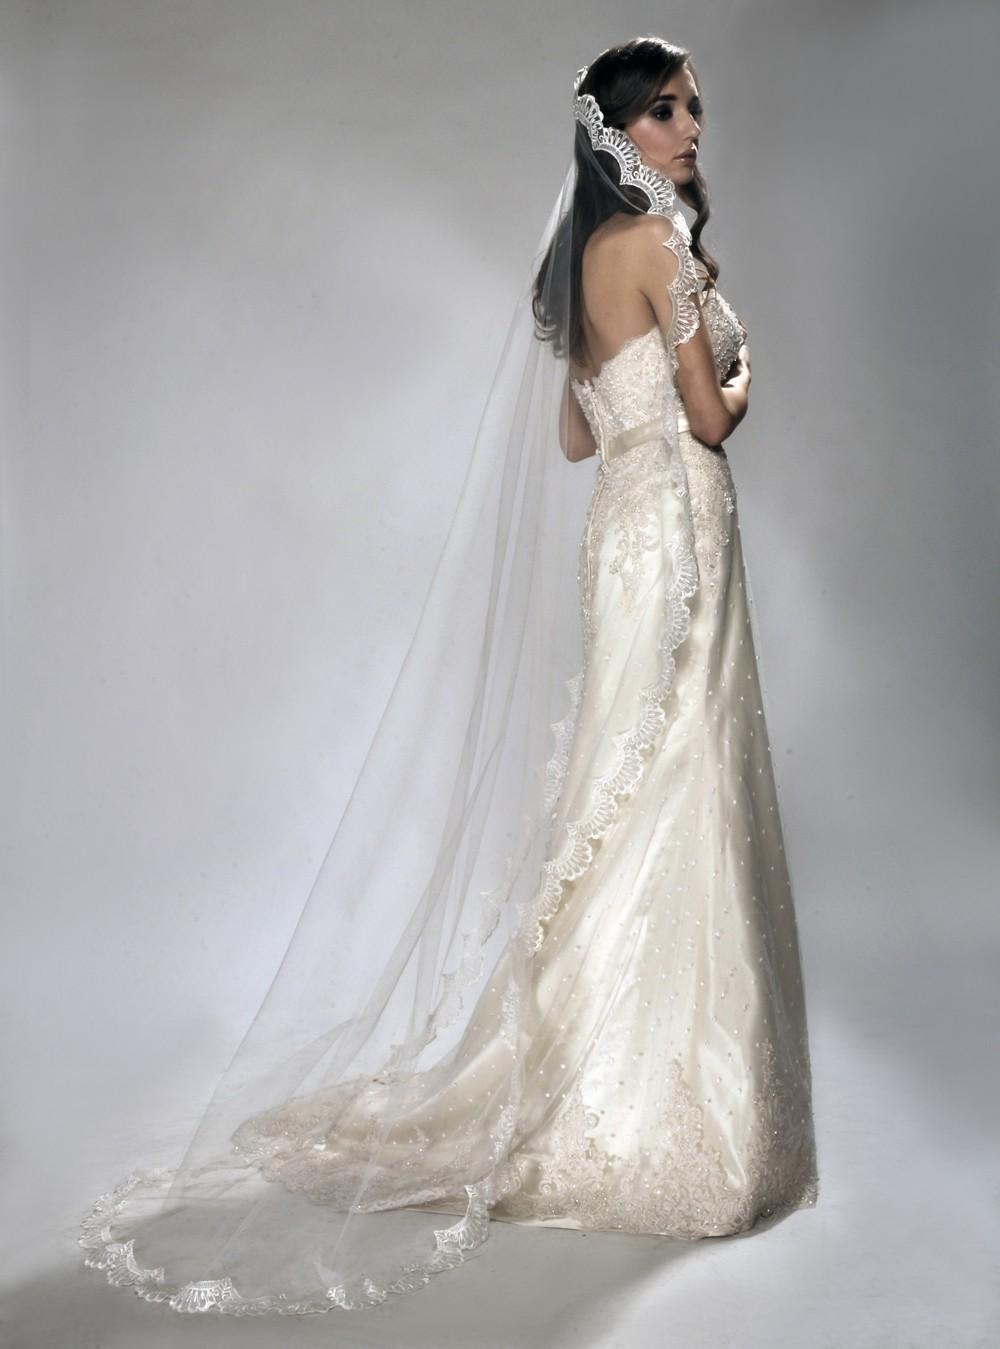 Chapel-length-bridal-veil-wedding-accessories-romantic-wedding-dress.full